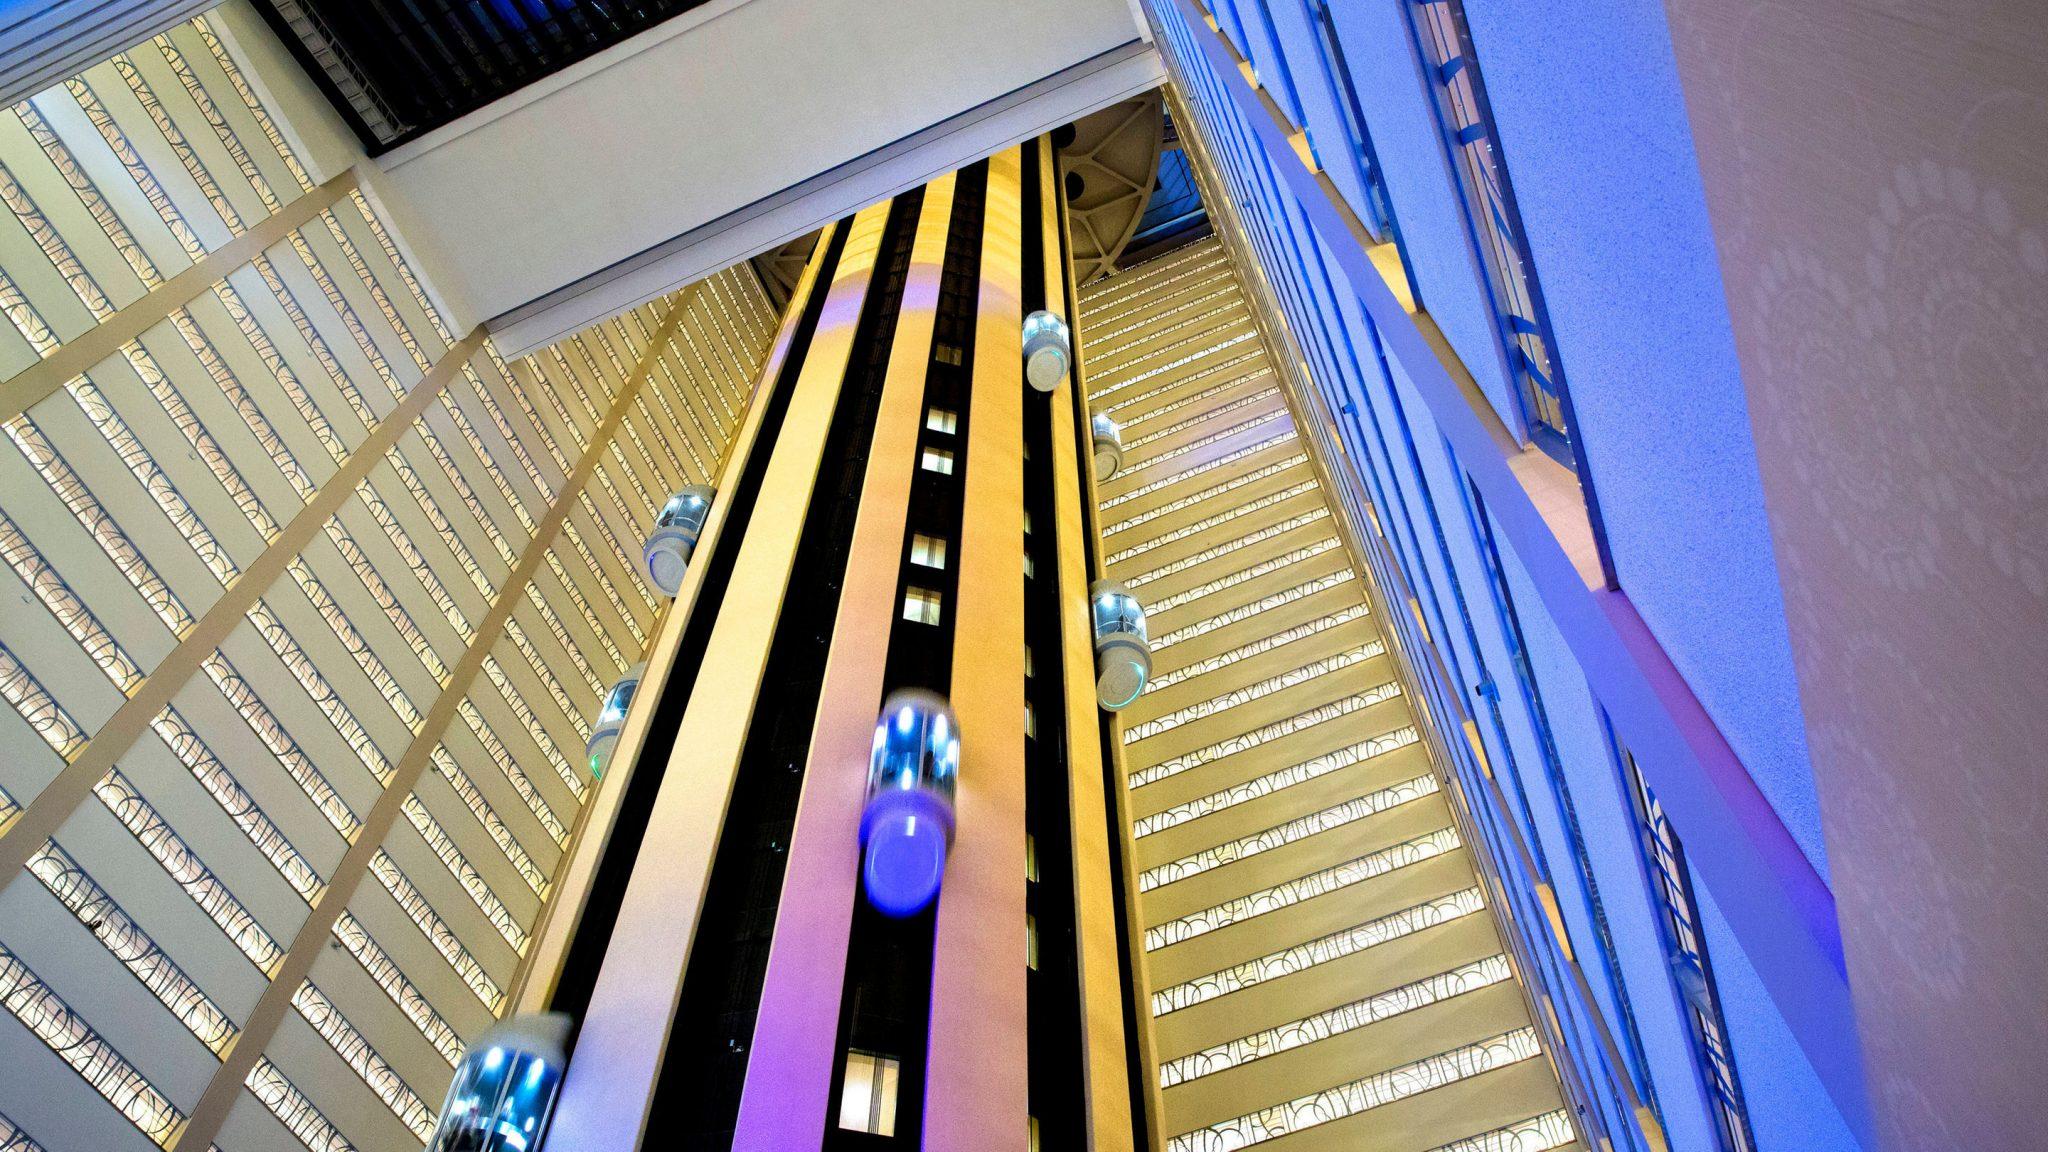 nycmq-elevators-0149-hor-wide